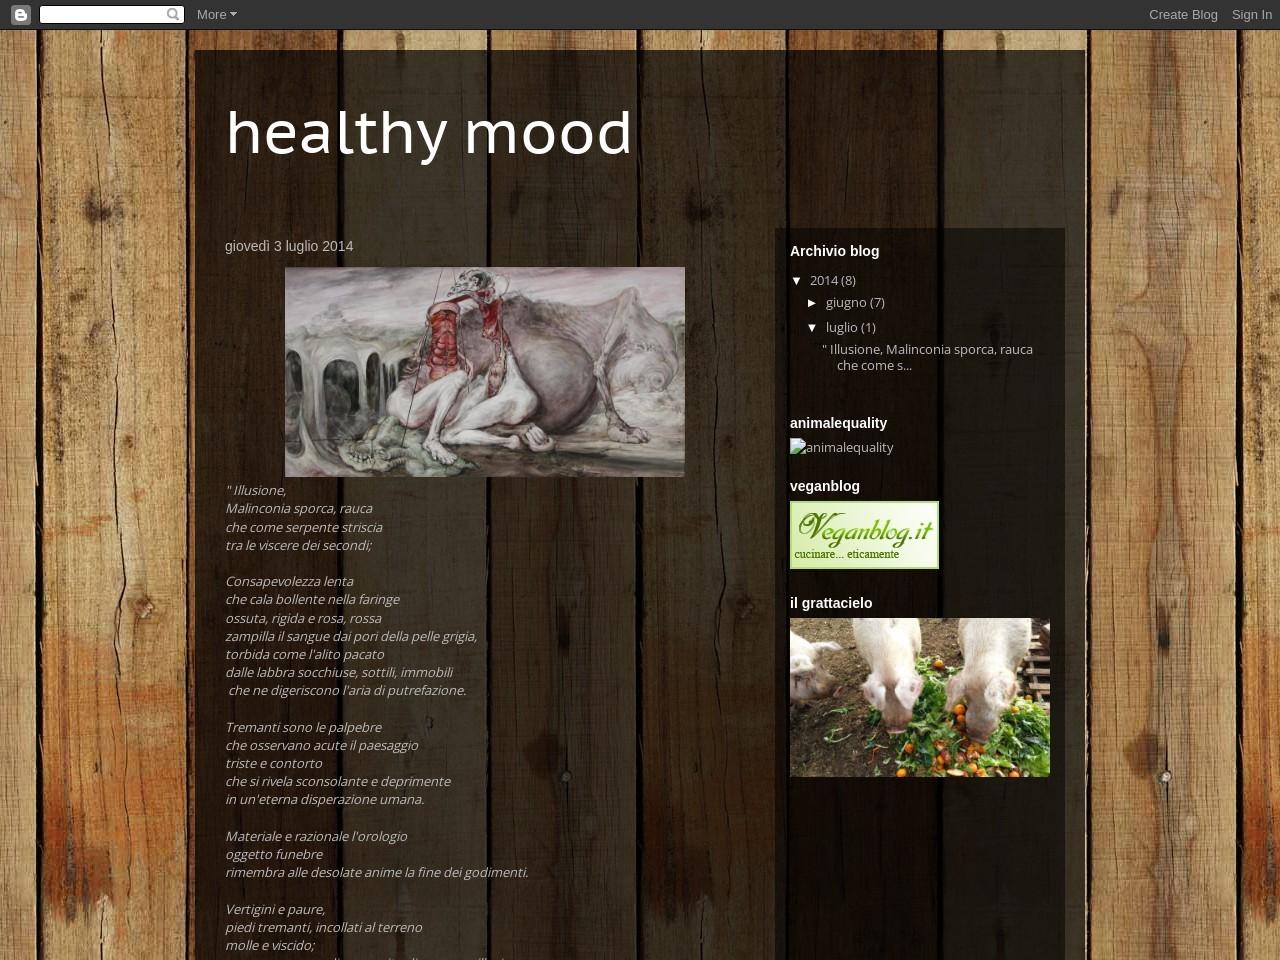 healthymoodveg